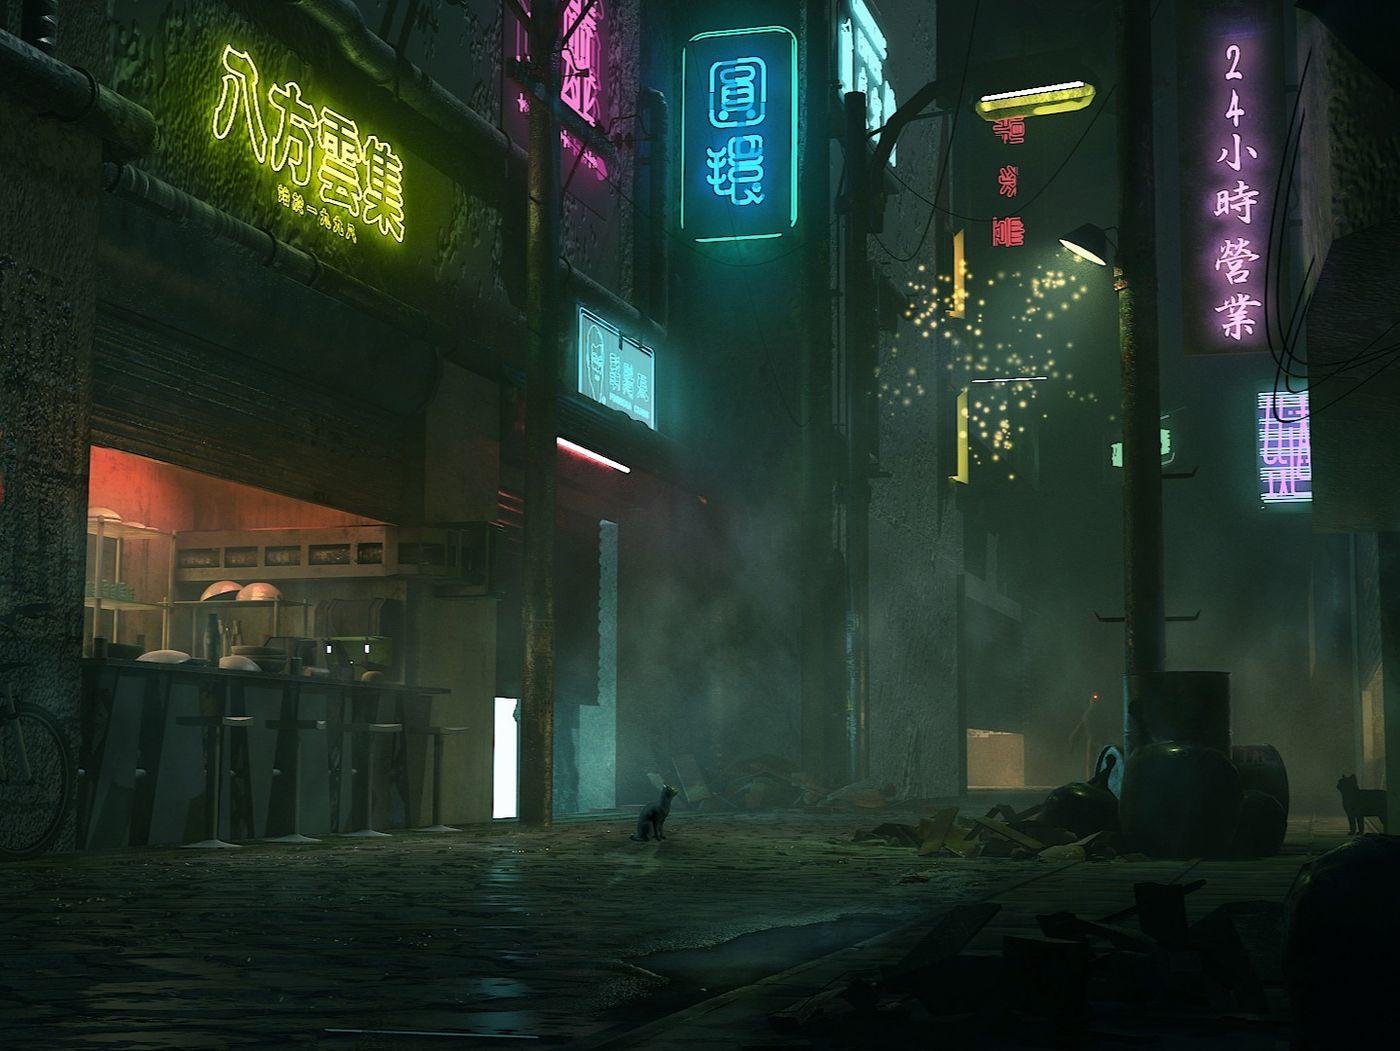 Cyberpunk Alley